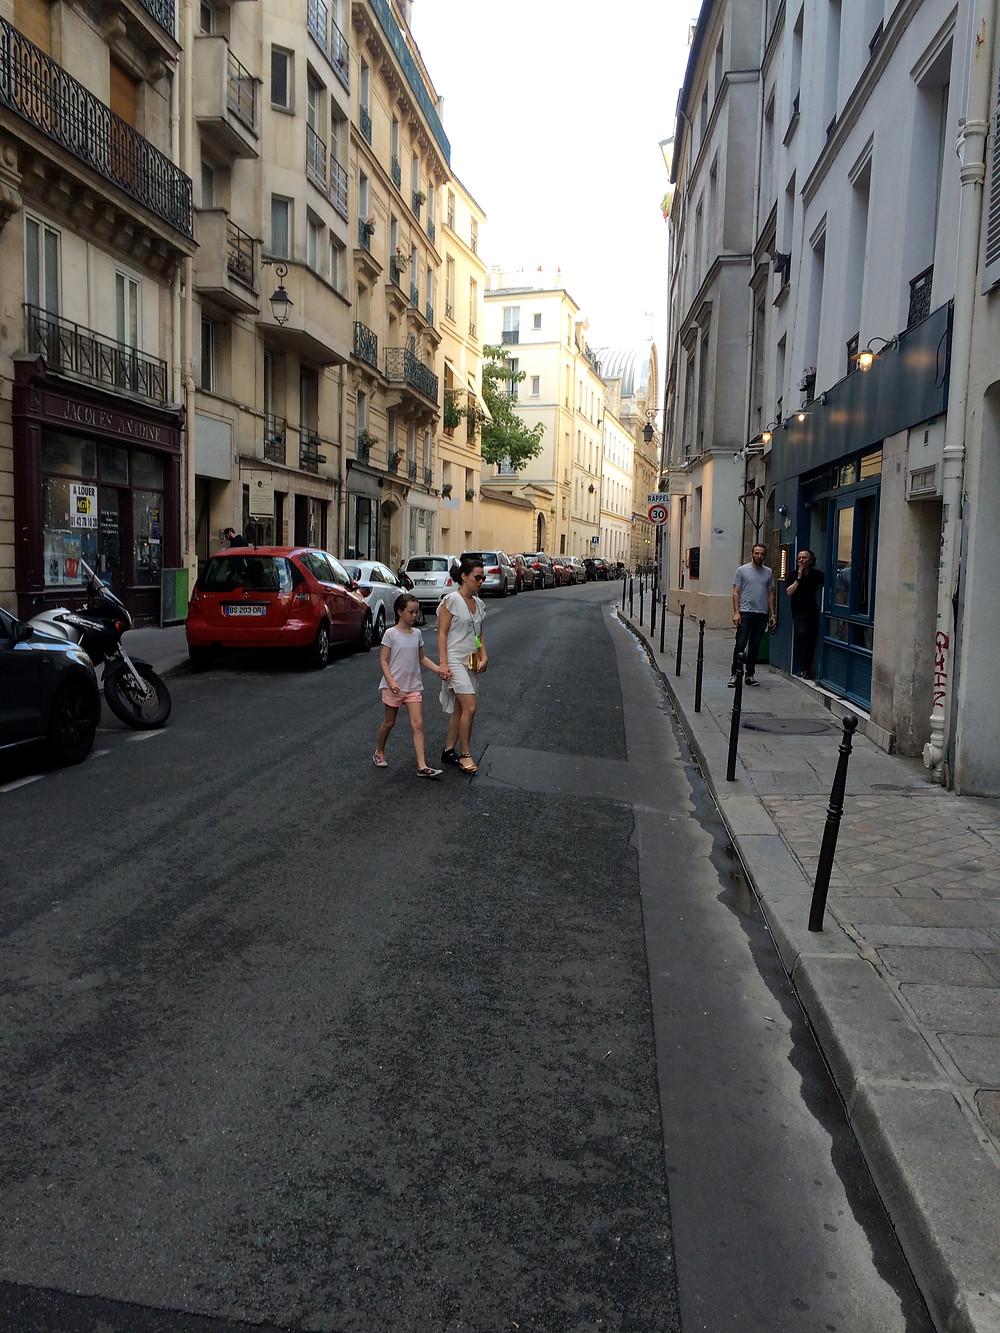 Street in Aix